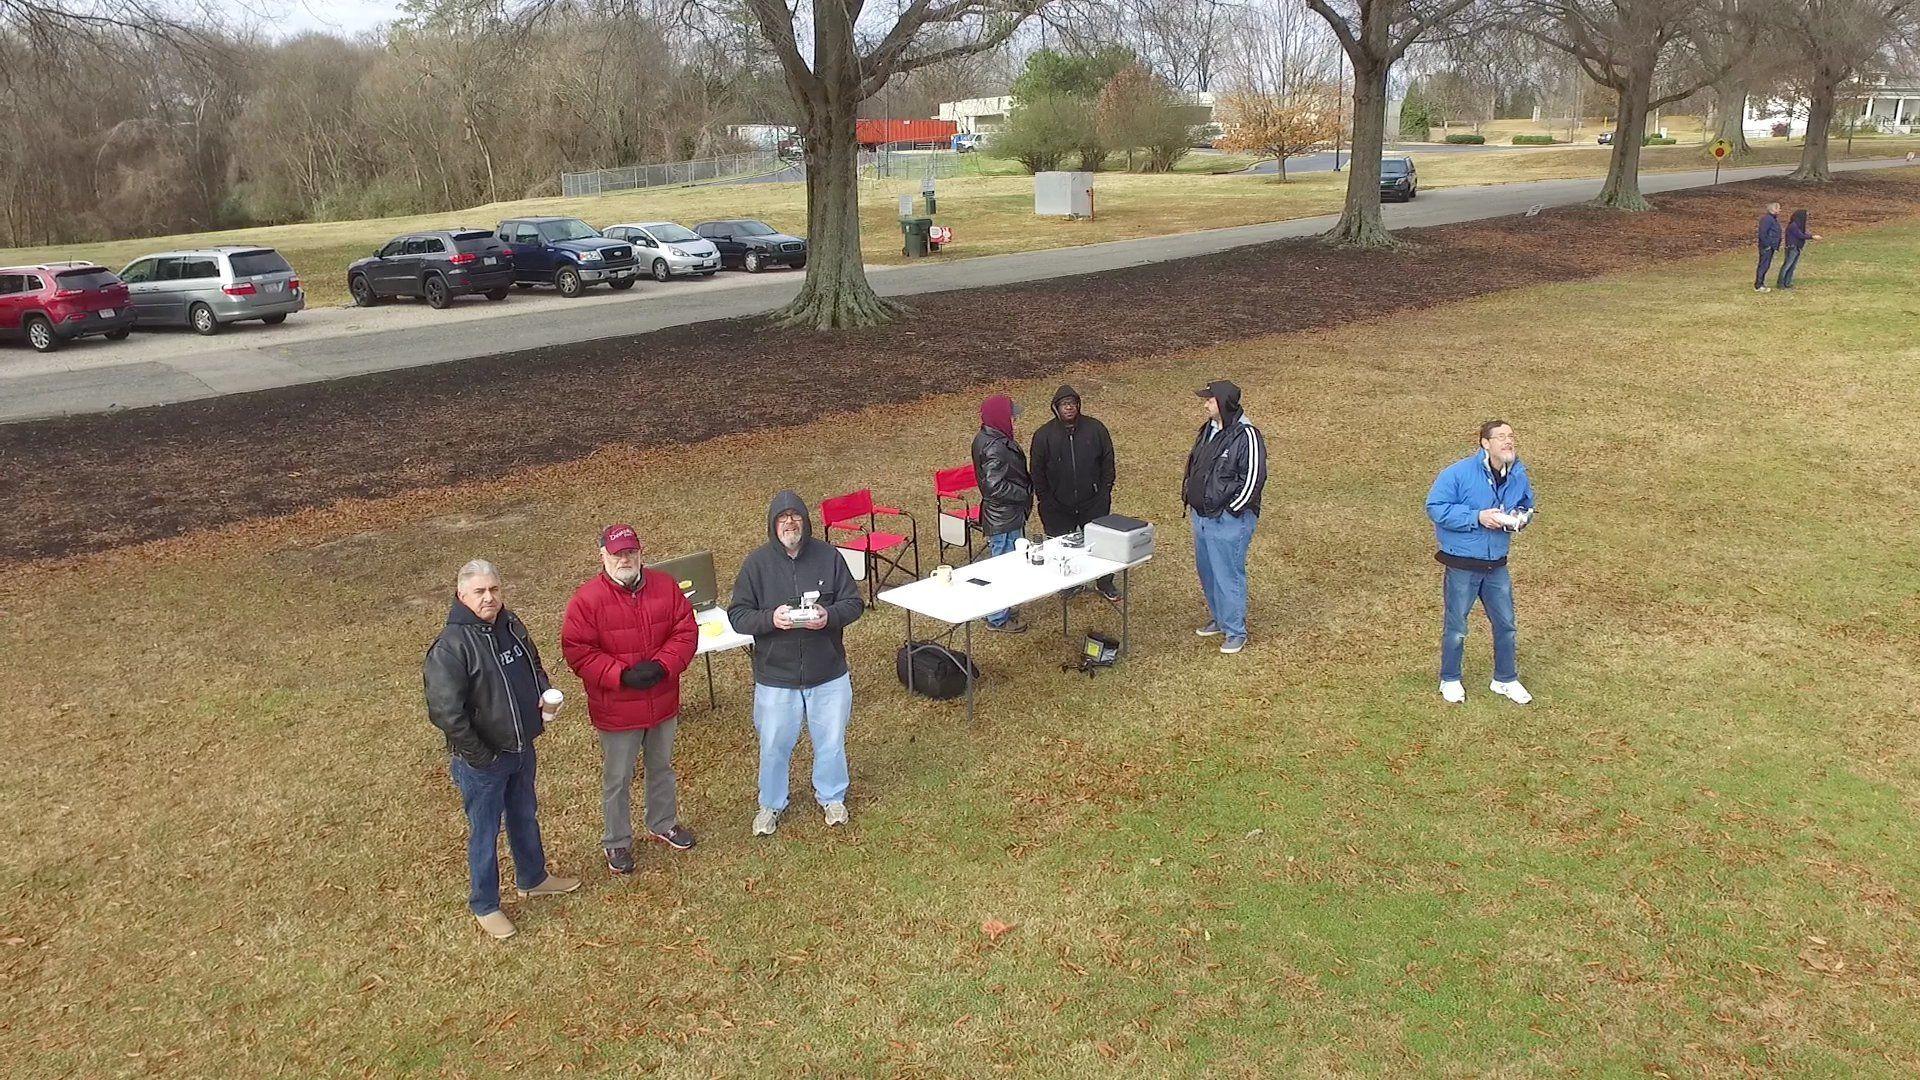 Raleigh Recreational Drone Meetup